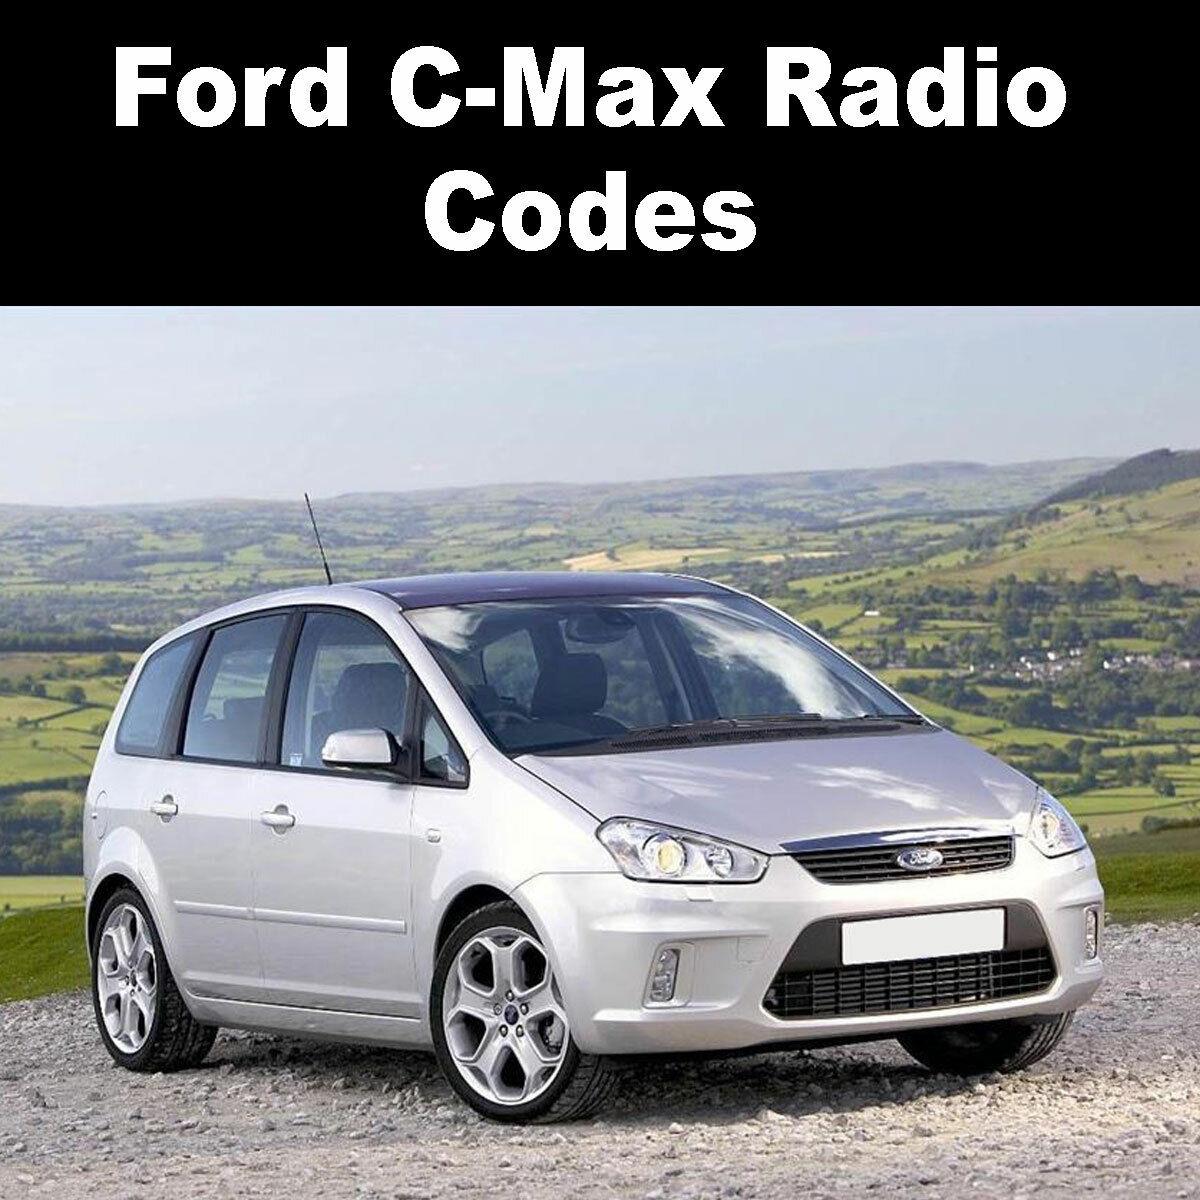 Ford Galaxy Radio Code Stereo Codes Pin Car Unlock Fast Service 6000cd